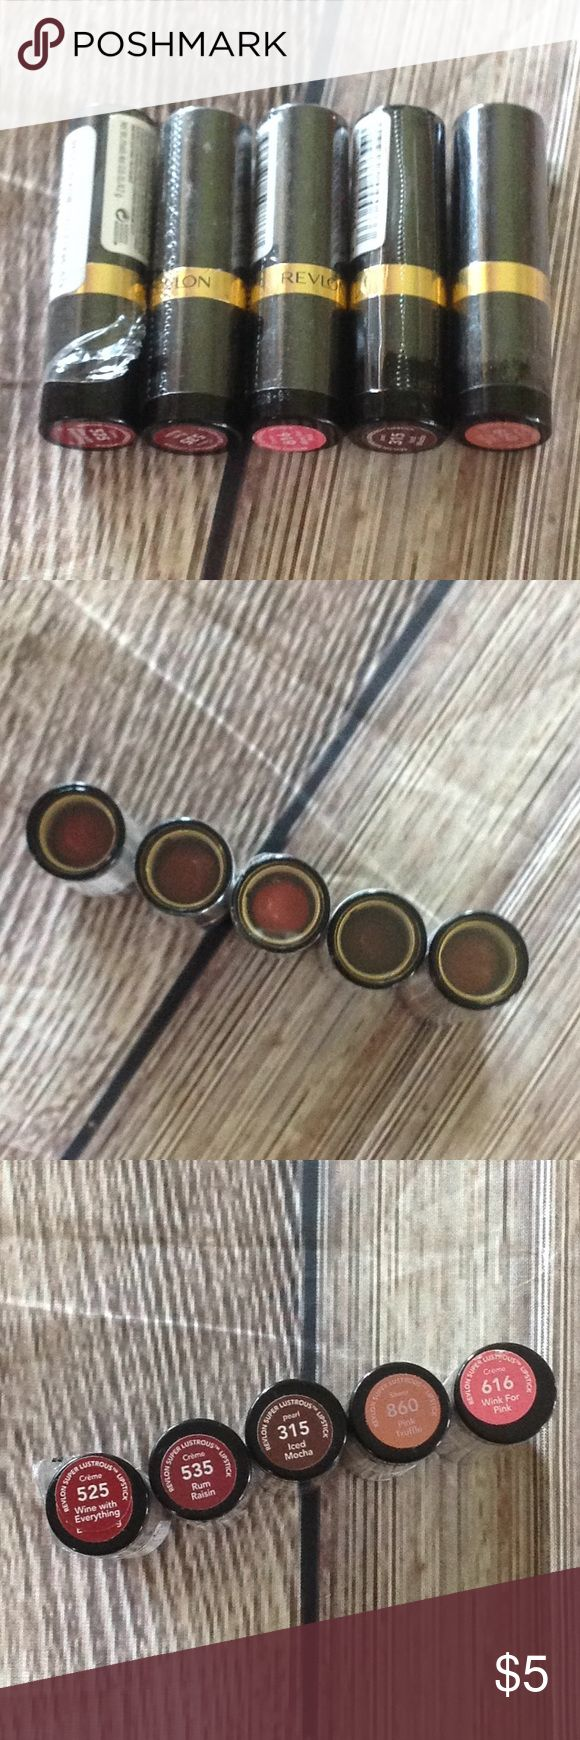 New Revlon Lipstick Brand new sealed (525 has damaged seal but never used!)  Rev…